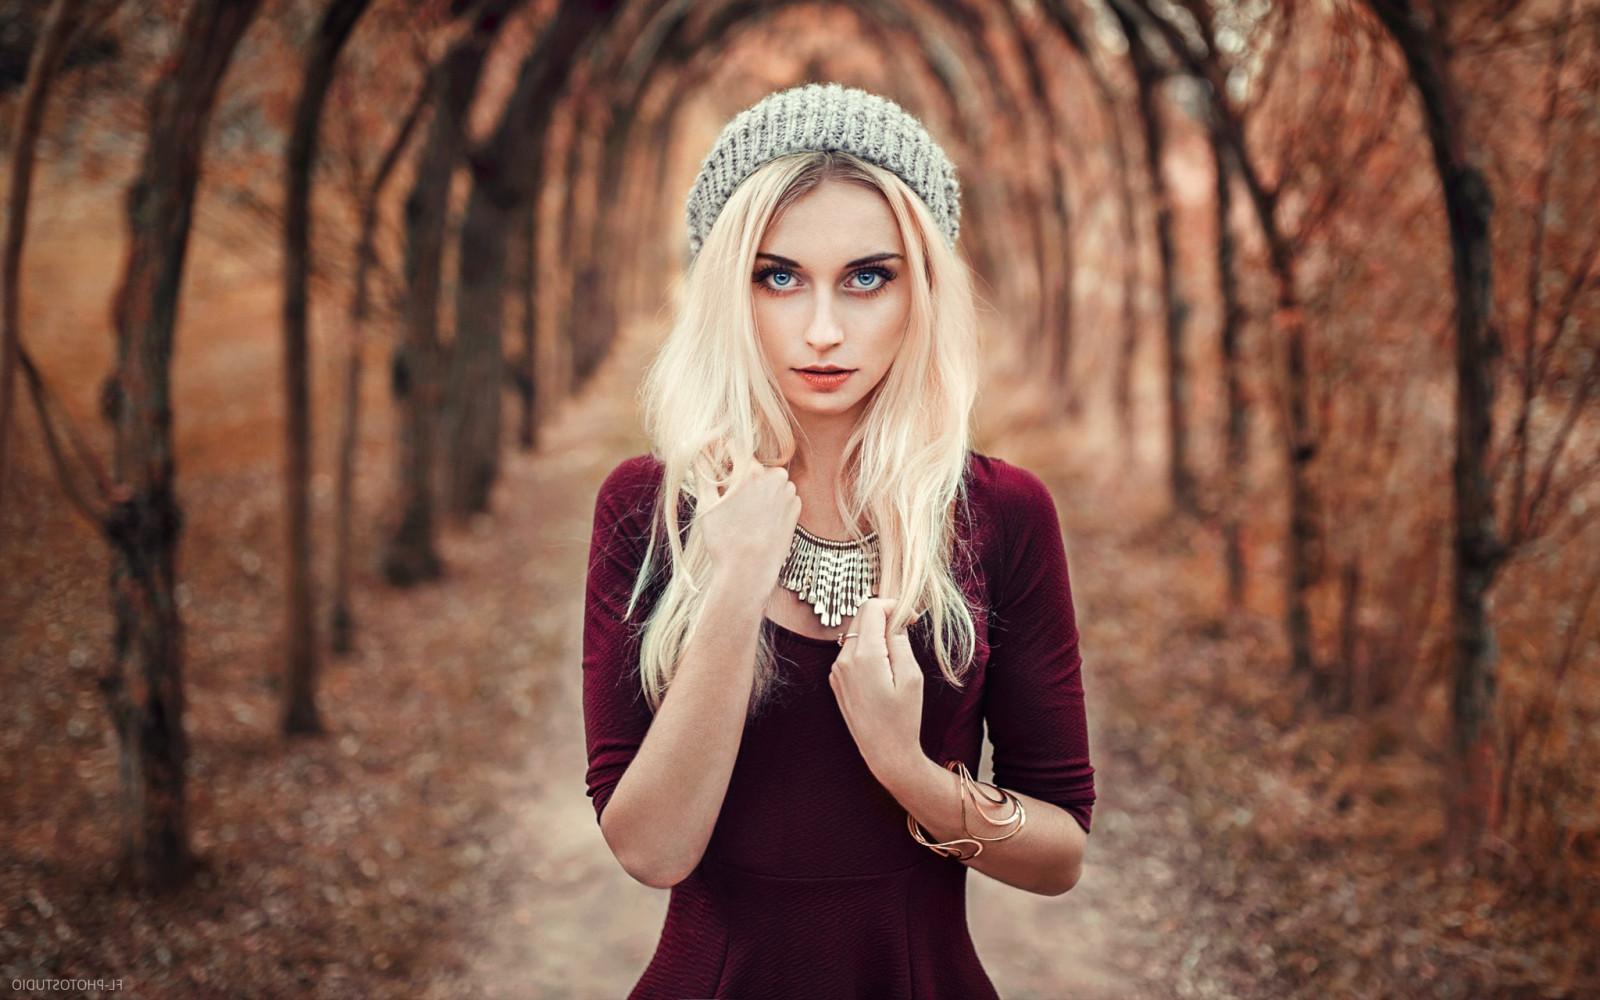 Wallpaper Face Women Model Blonde Long Hair Blue: Wallpaper : Face, Women Outdoors, Model, Depth Of Field